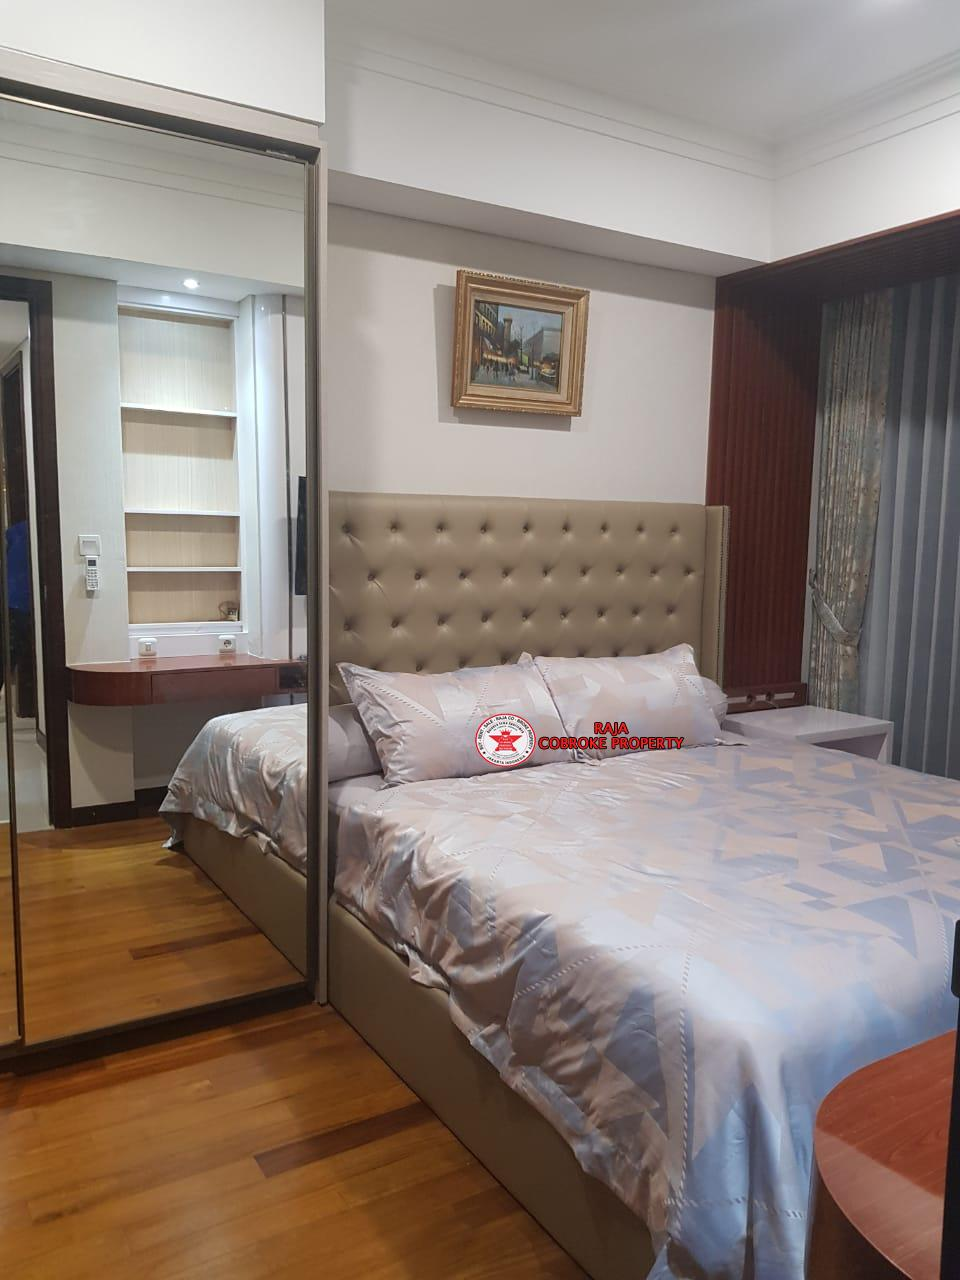 2BR Angelo CasaGrande Residence sewa bulanan tahunan  apartemen mega kuningan,apartemen casablanca casagrande residence,apartemen kuningan city denpasar residence EDDA93F8 7E4D 4082 80D1 6DDF8E70BF44